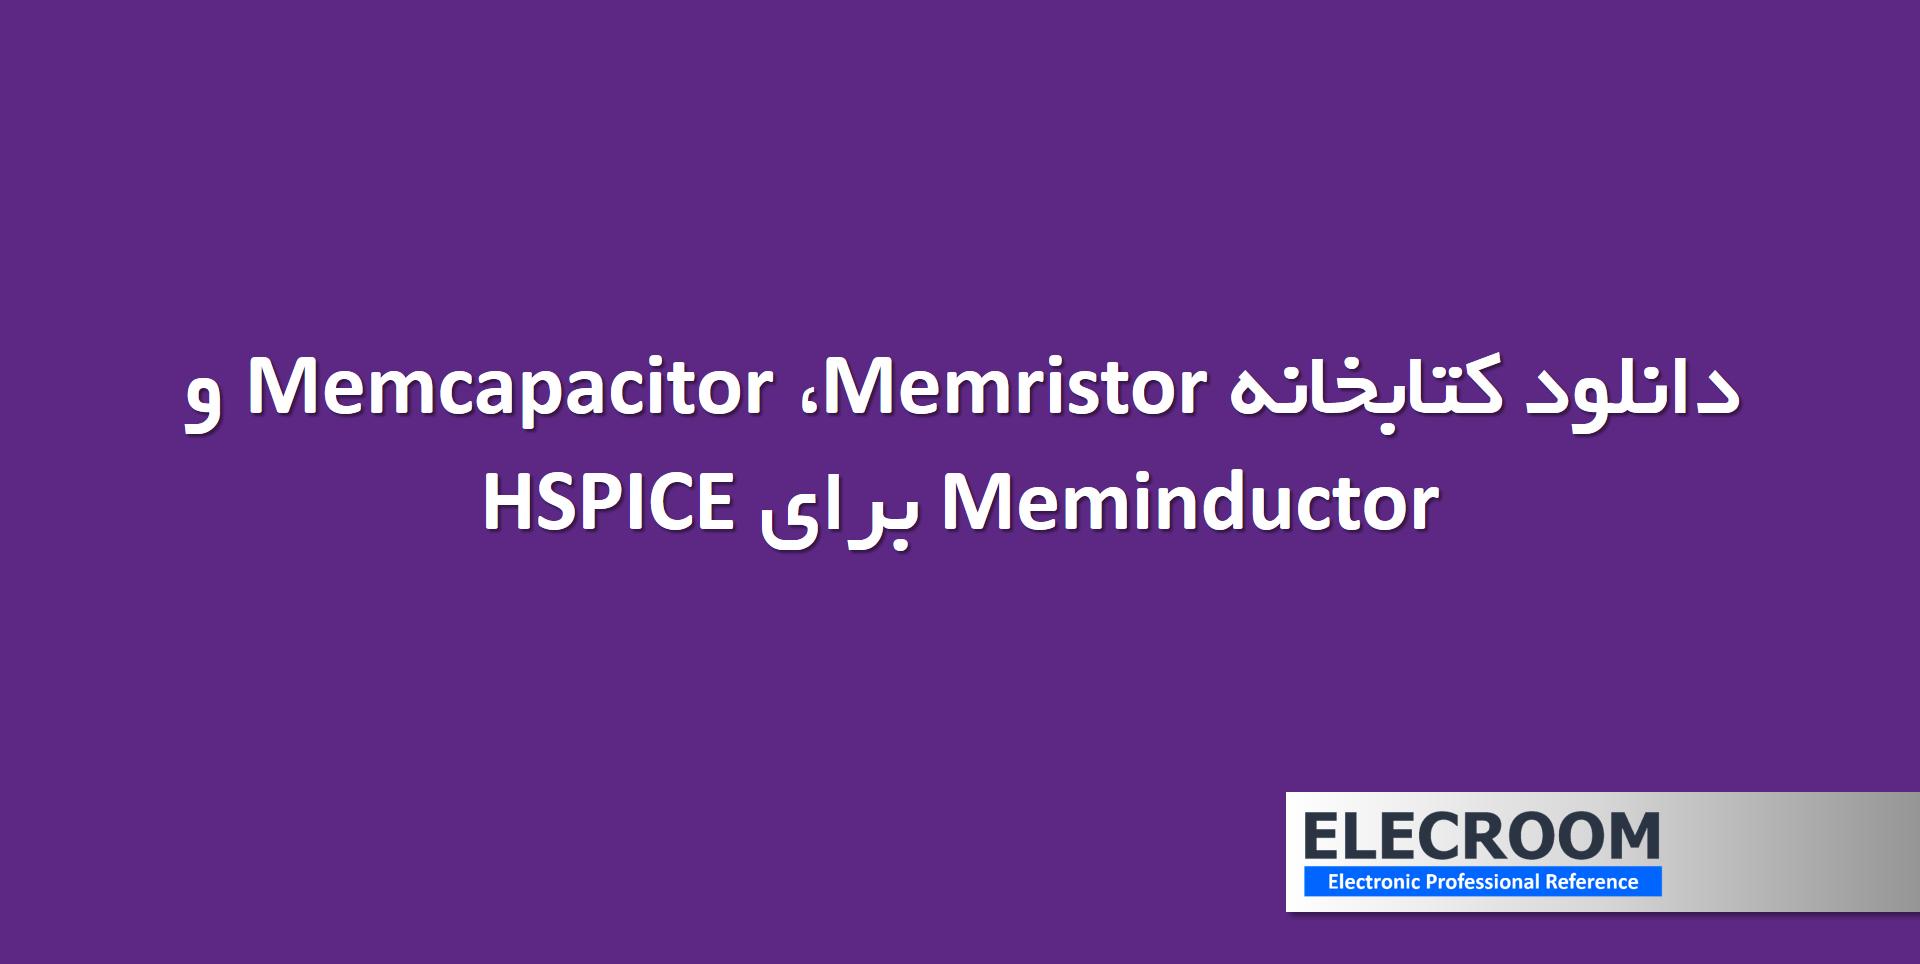 کتابخانه Memristor و Memcapacitor و Meminductor برای HSPICE